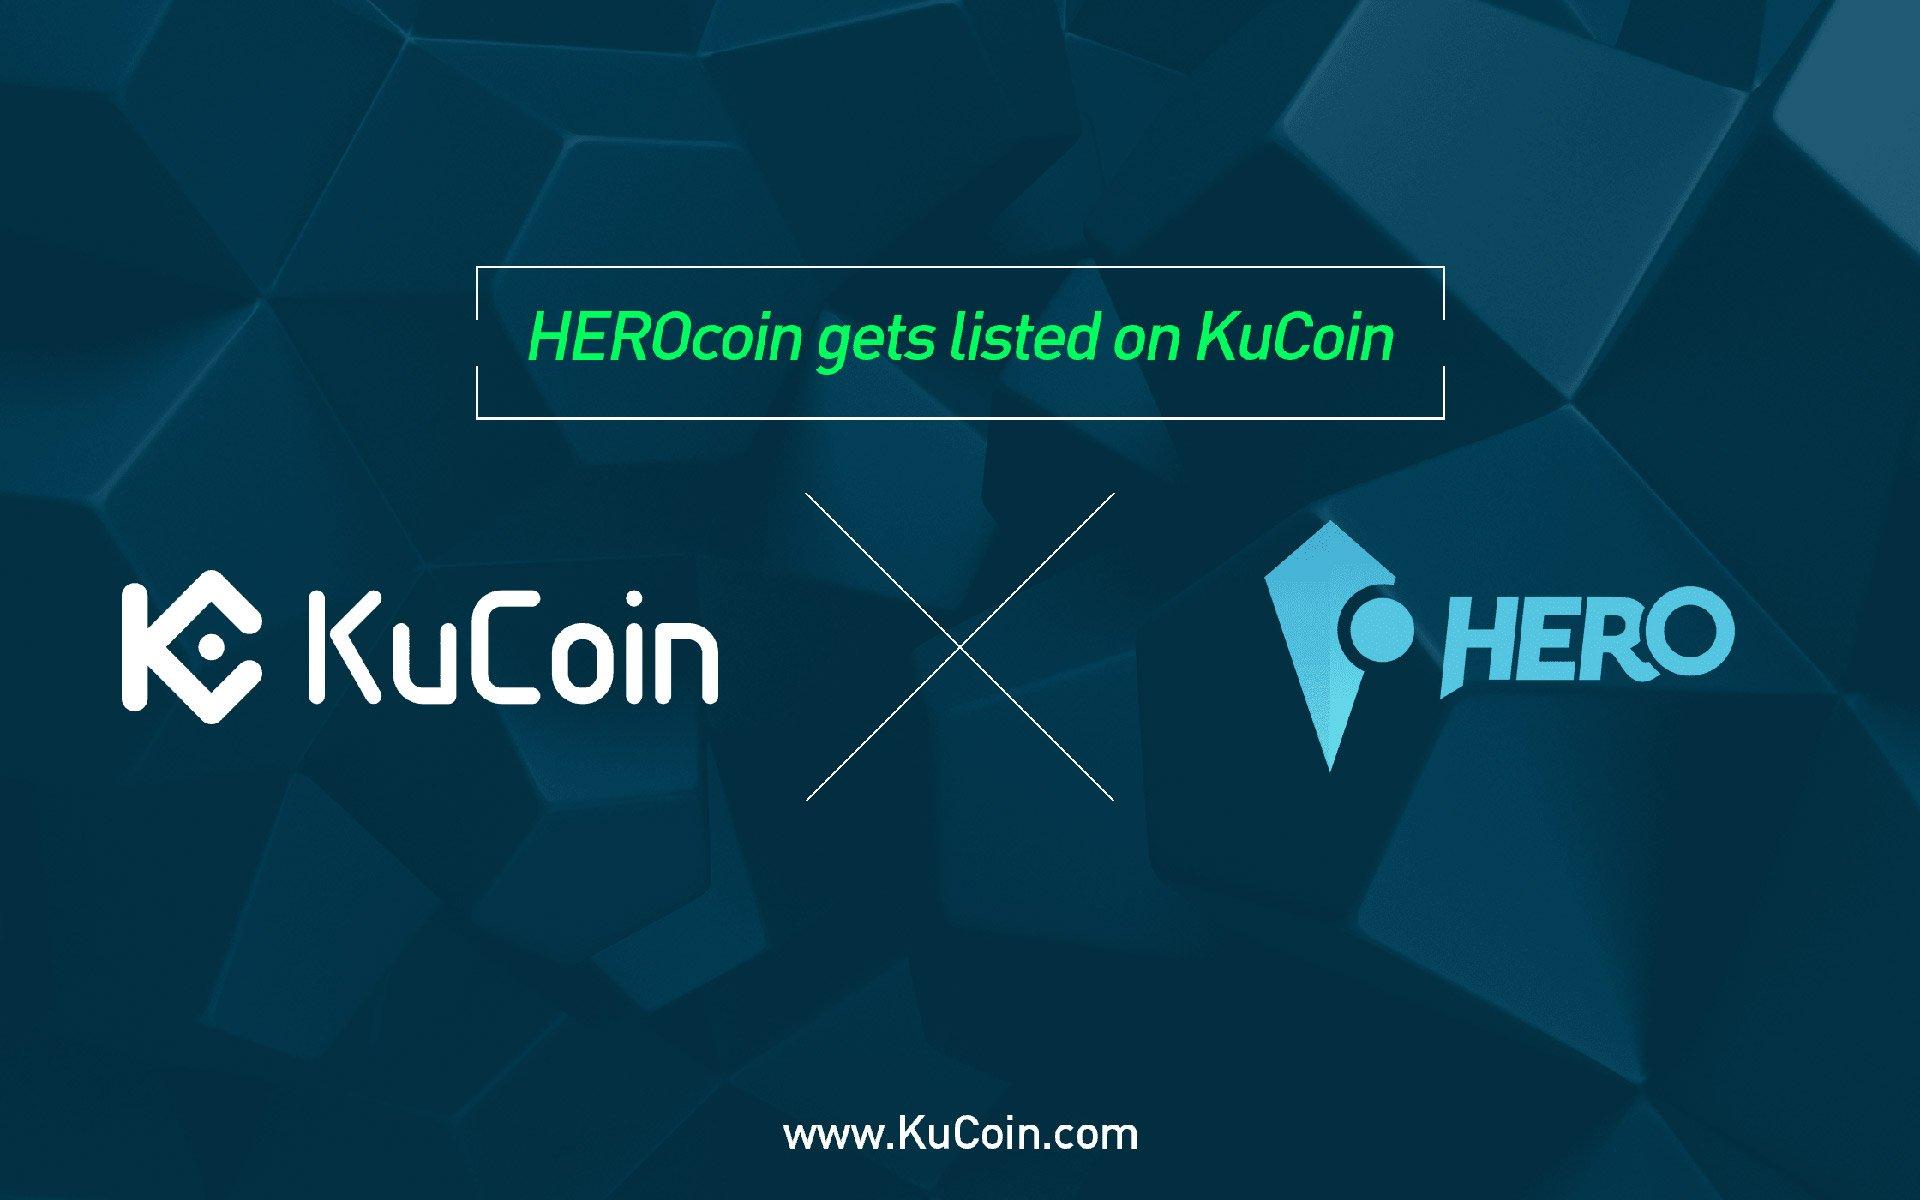 HEROcoin(PLAY) gets listed on KuCoin!